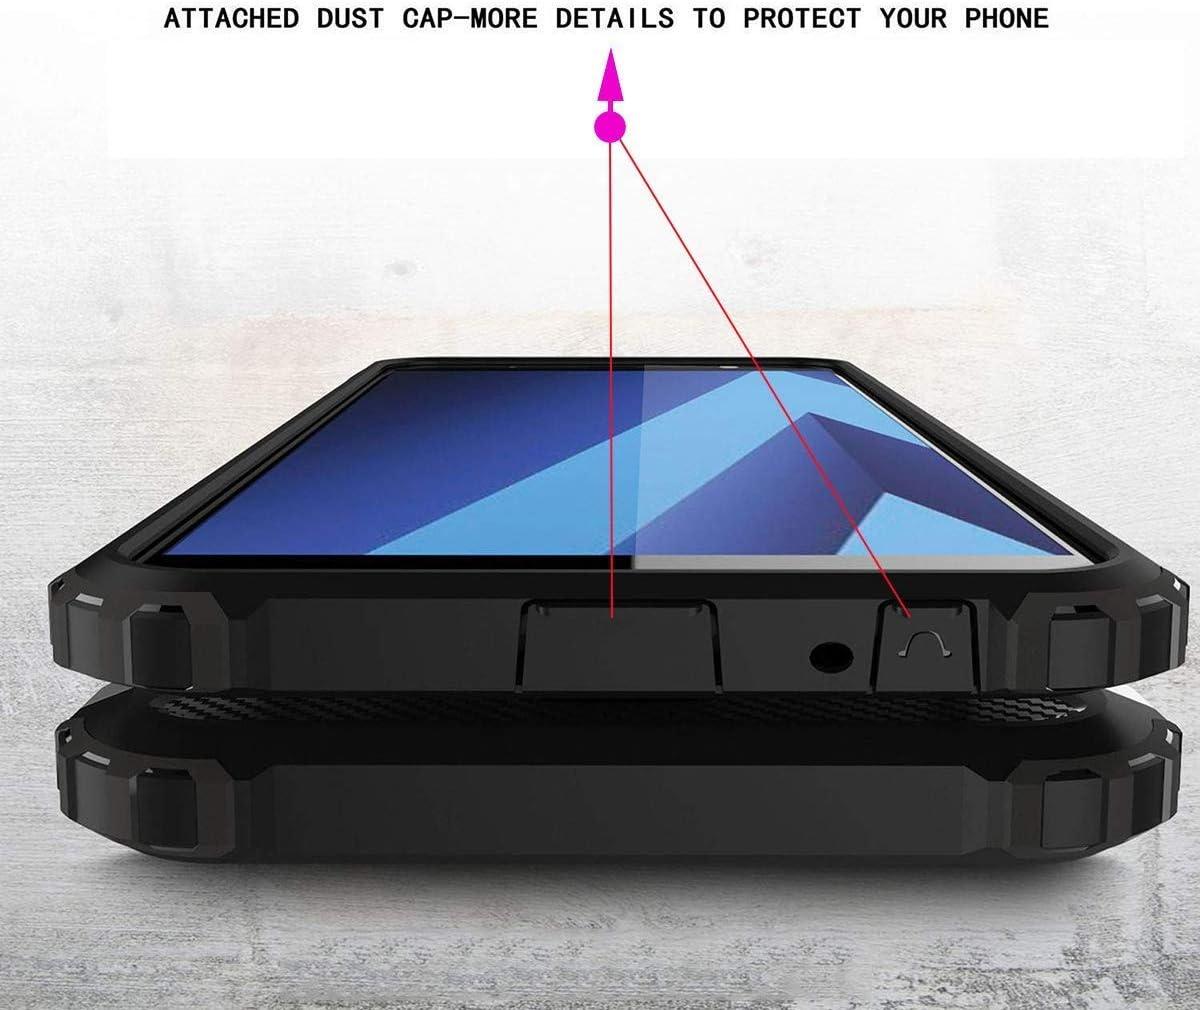 TenYll Huawei Mate 20 Lite Custodia,Protezione Antiurto per PC TPU Antiurto,Anti-Graffio,per Huawei Mate 20 Lite Custodia -Oro Rosa